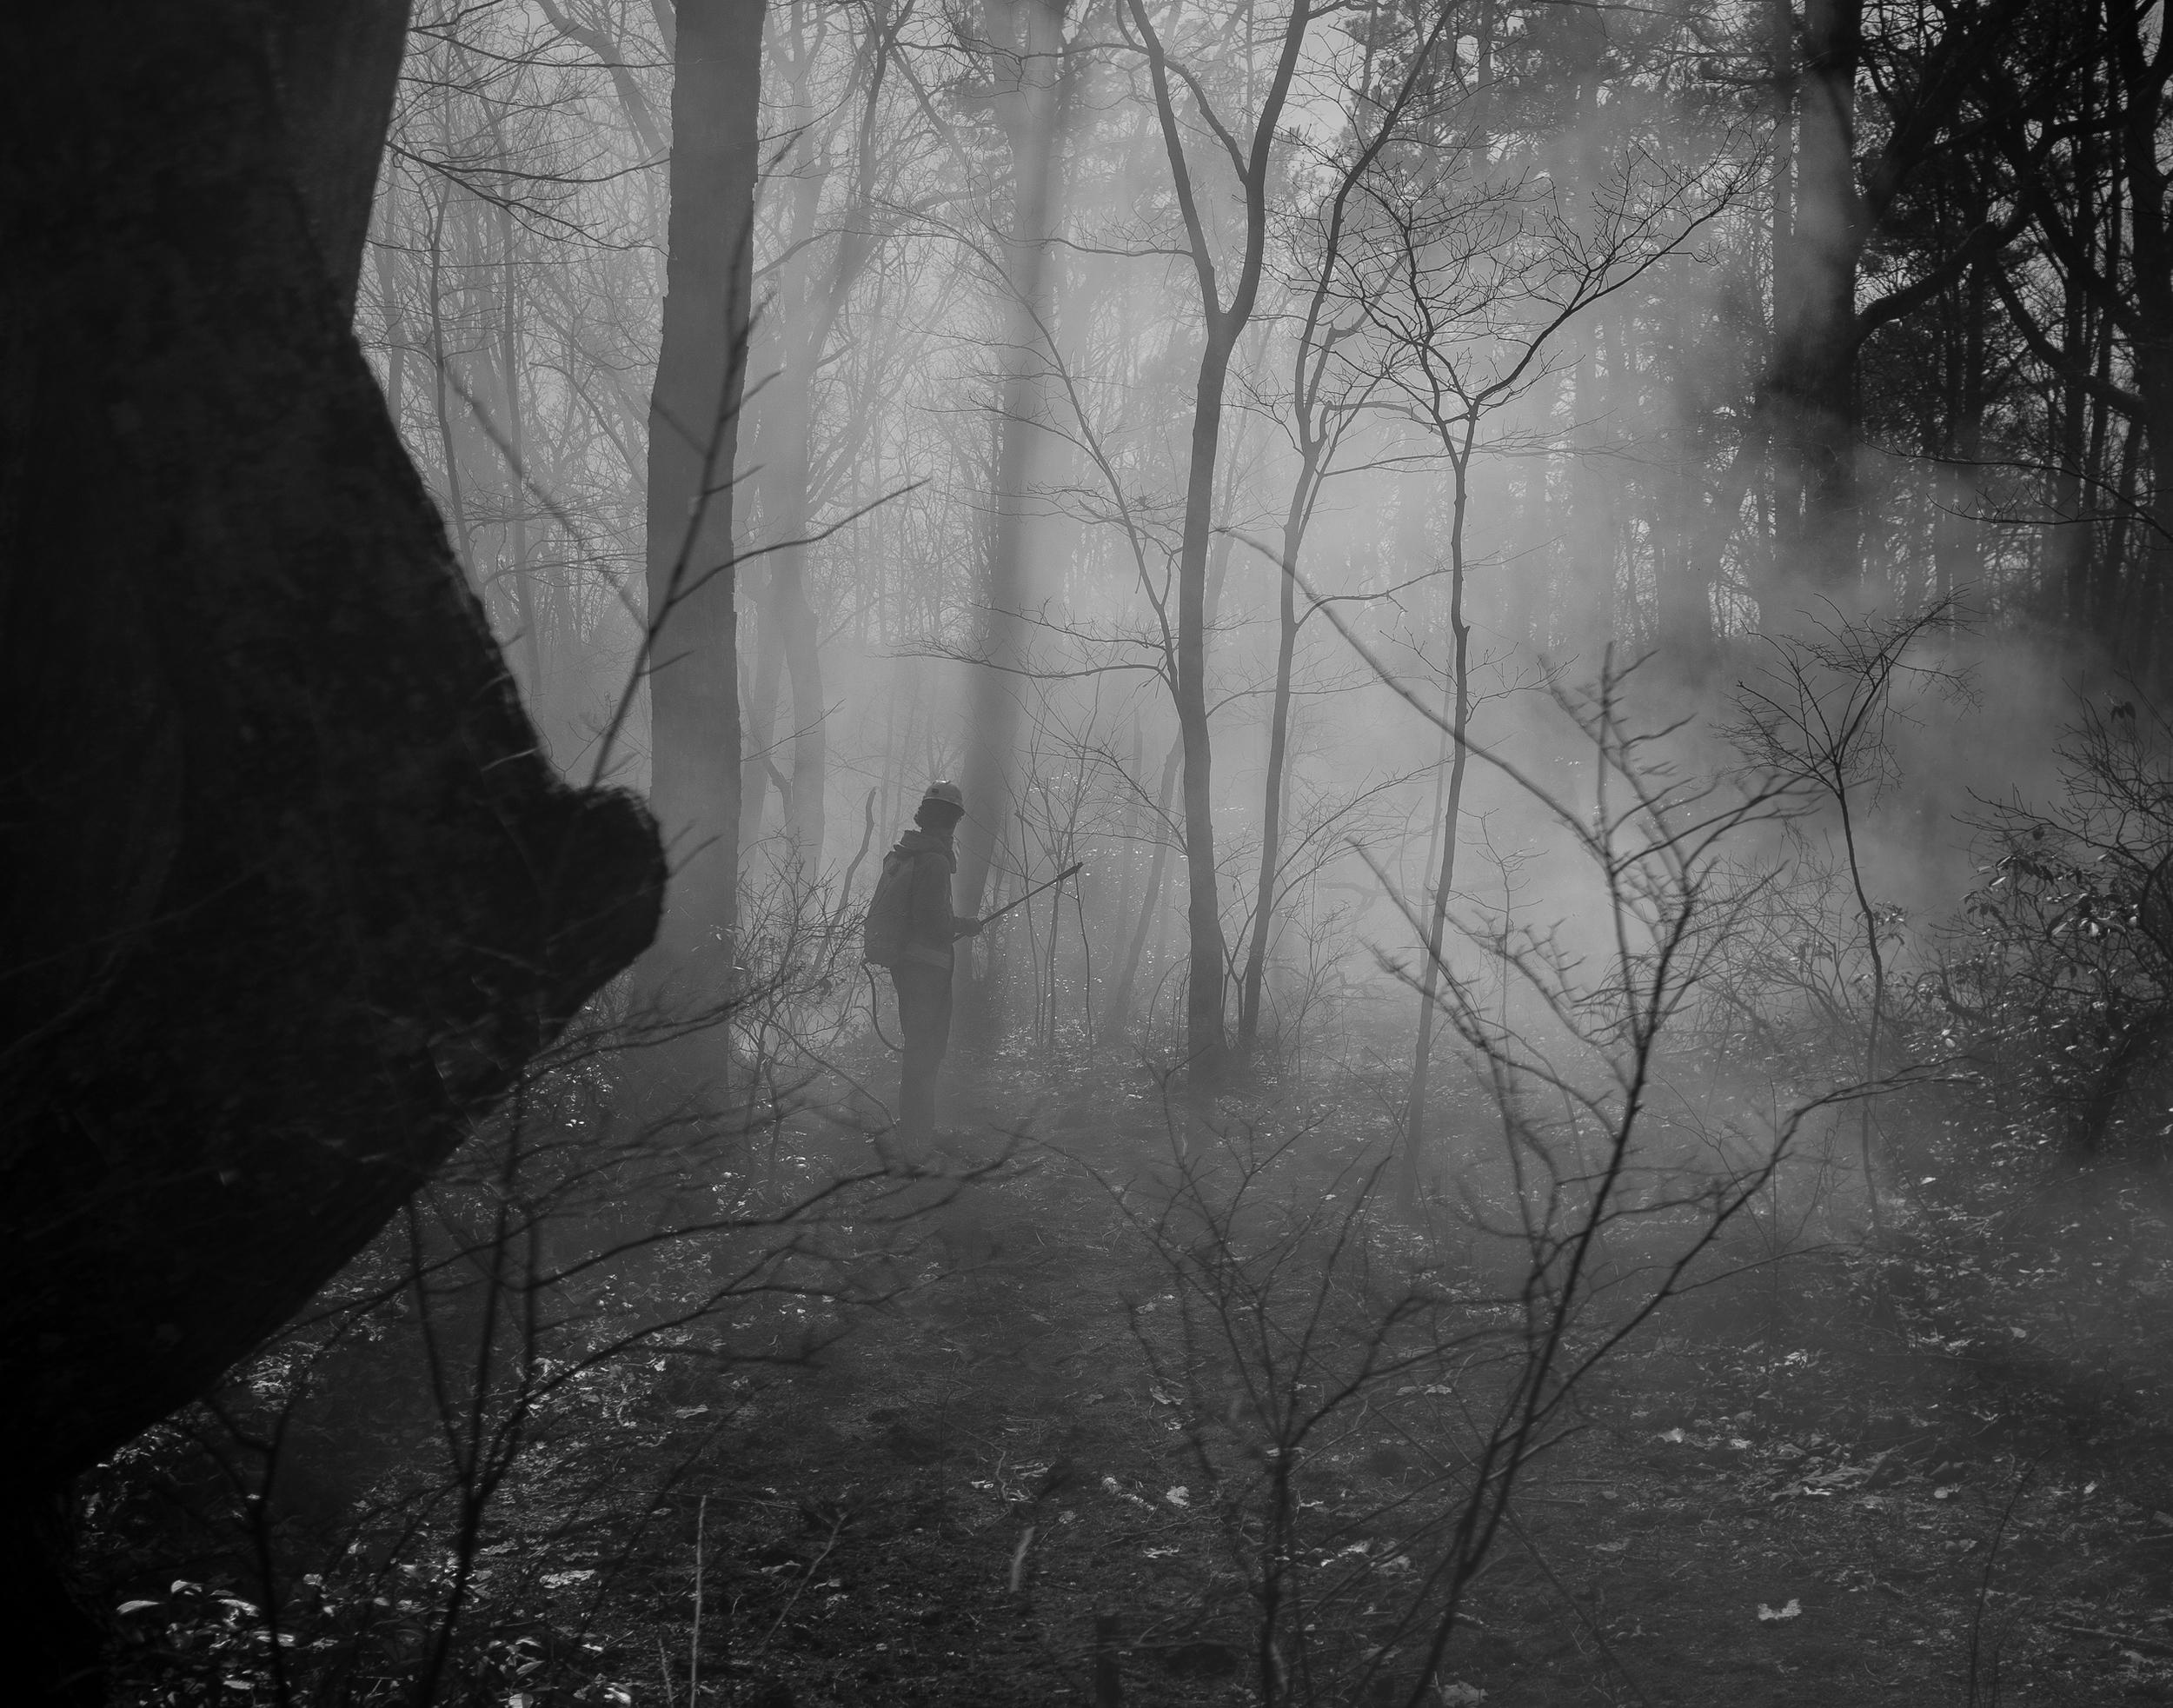 haze   2014 Sewanee, TN  digital capture